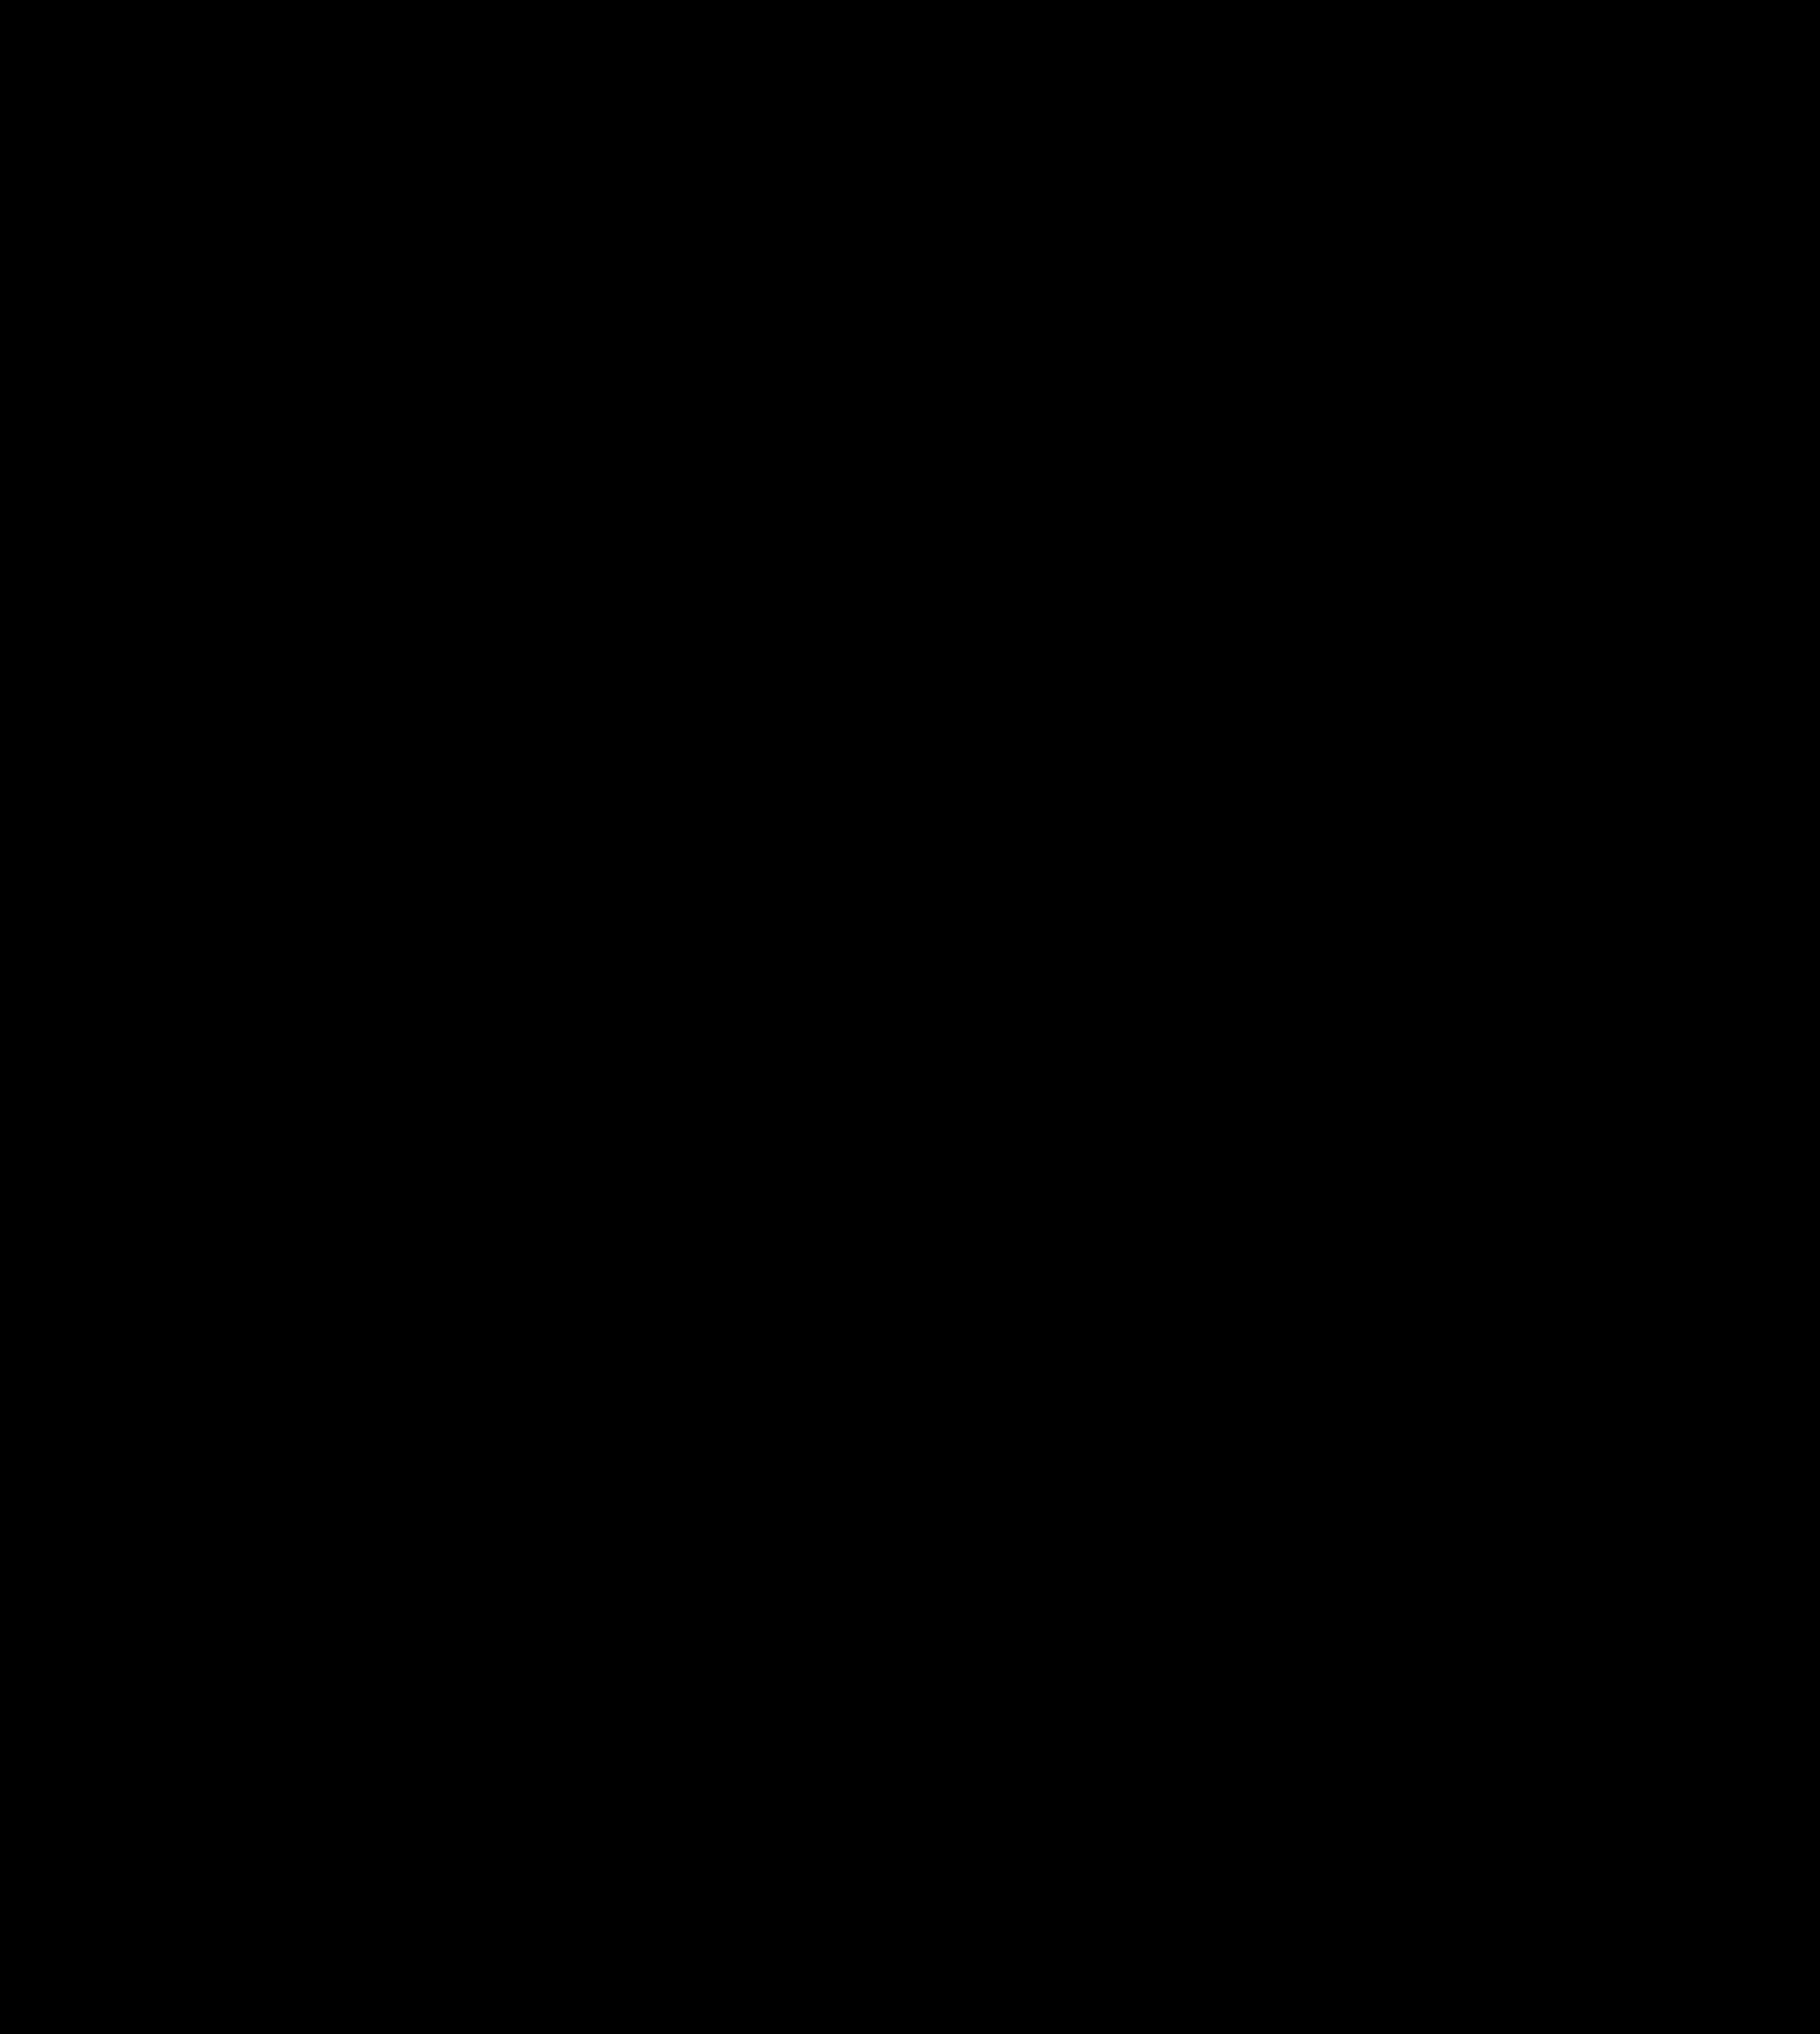 Microsoft office clipart snowflake black clip art black and white stock Clipart - Snowflake Fractal clip art black and white stock